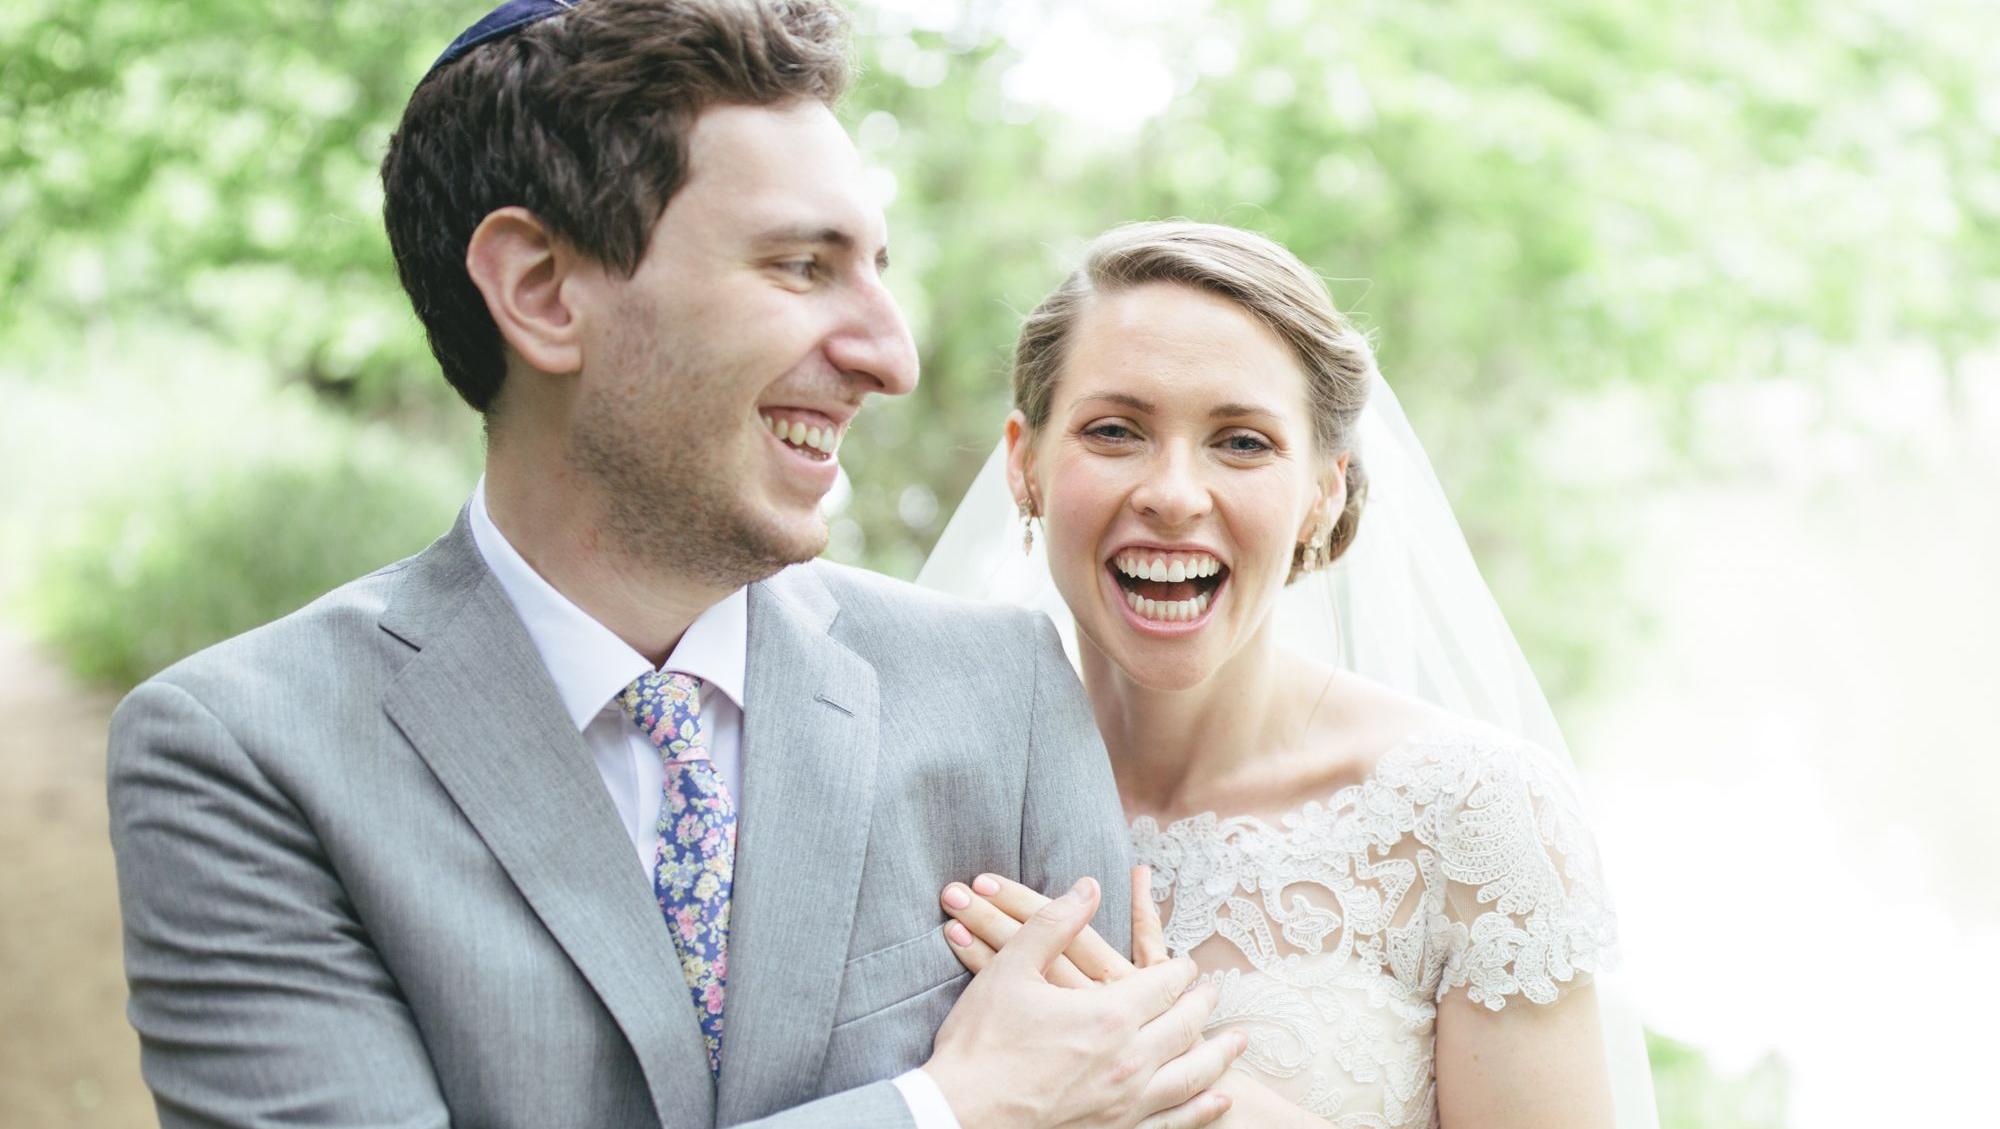 Libertty print floral wedding ties